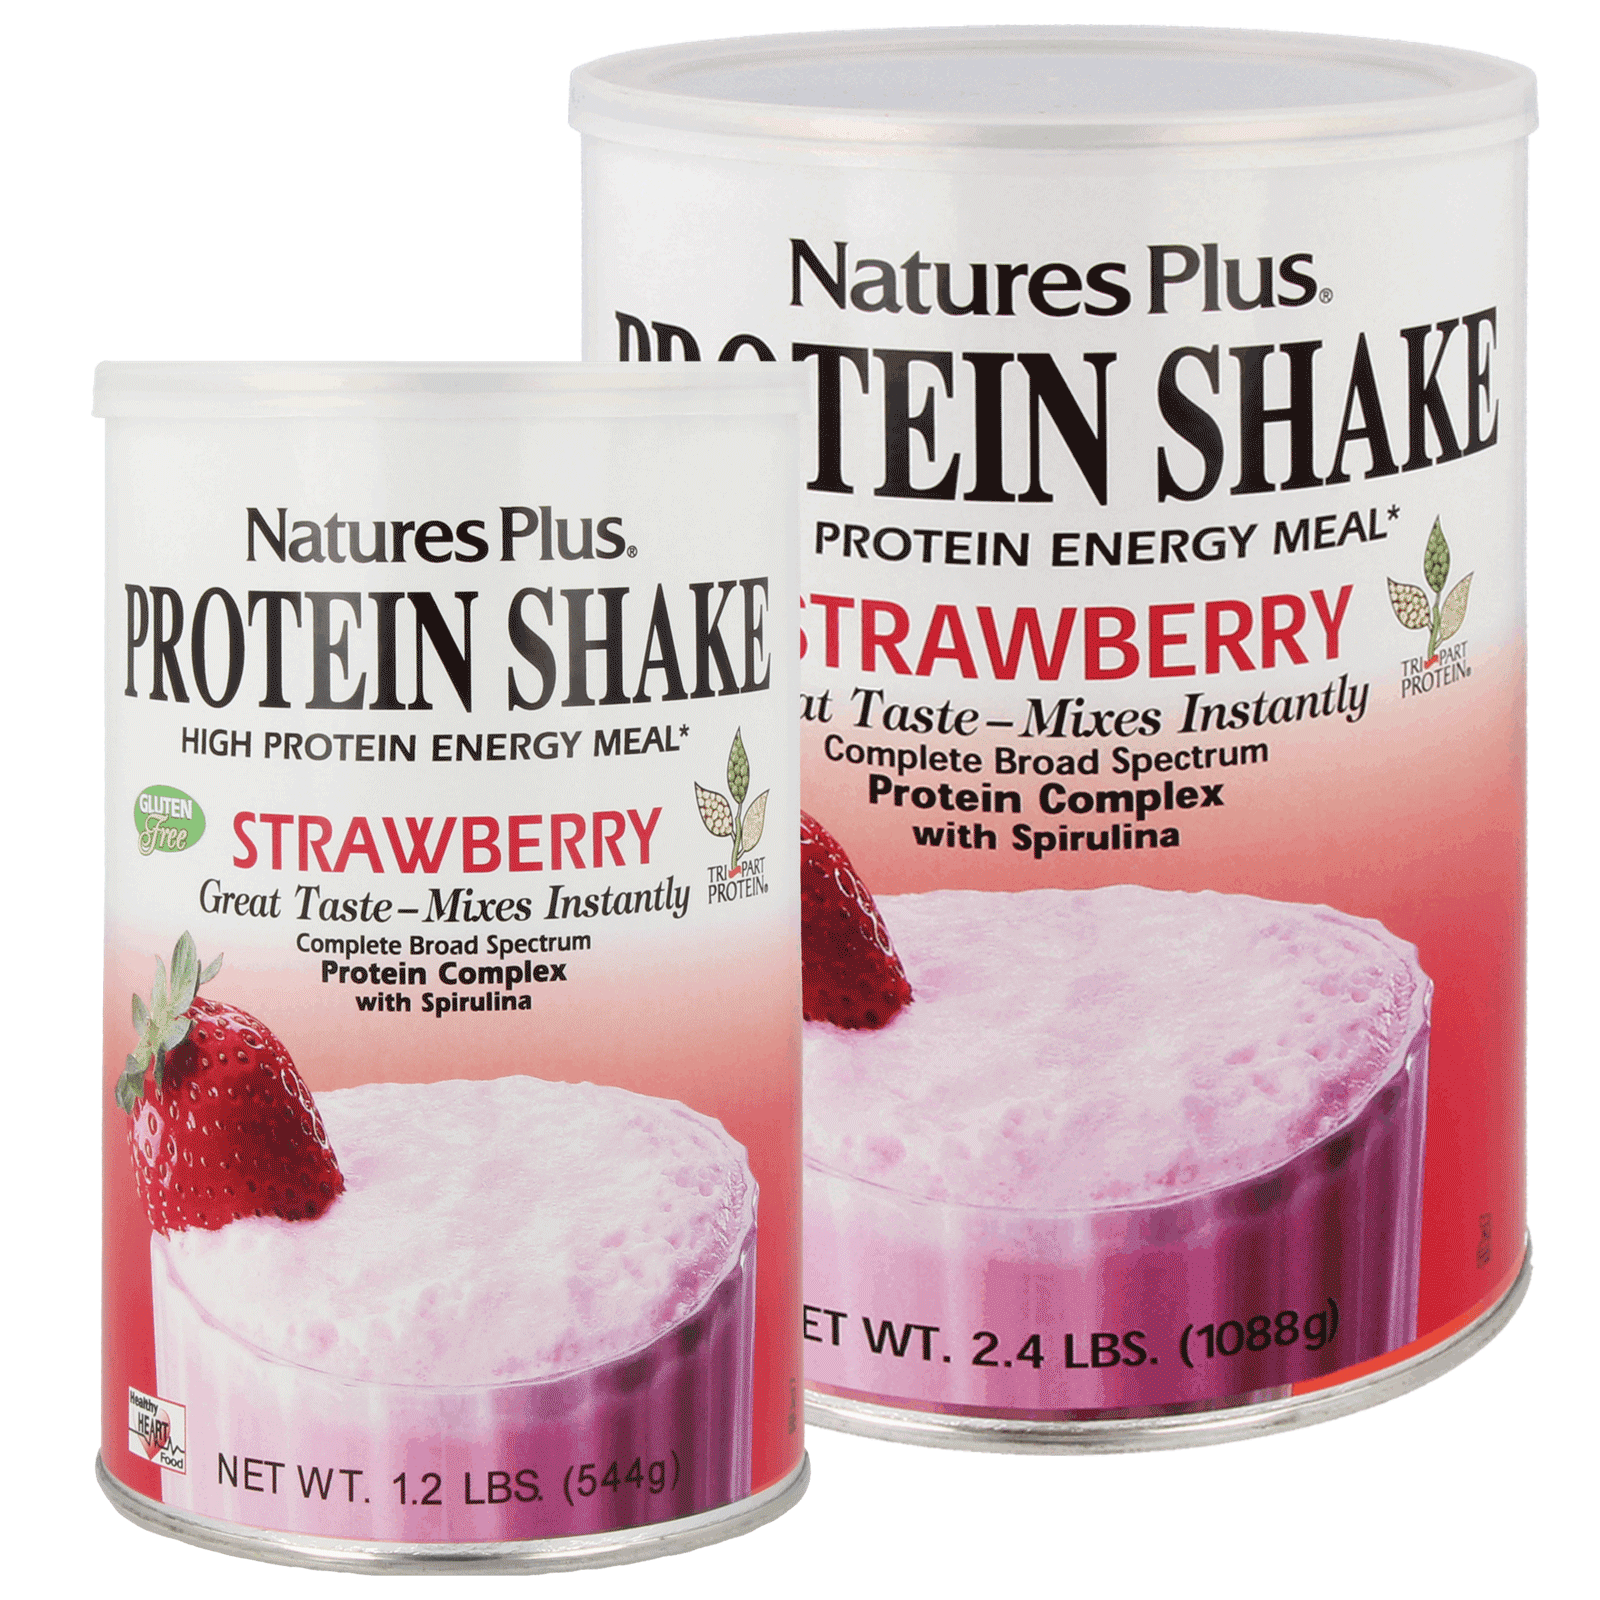 Protein Shake - Strawberry